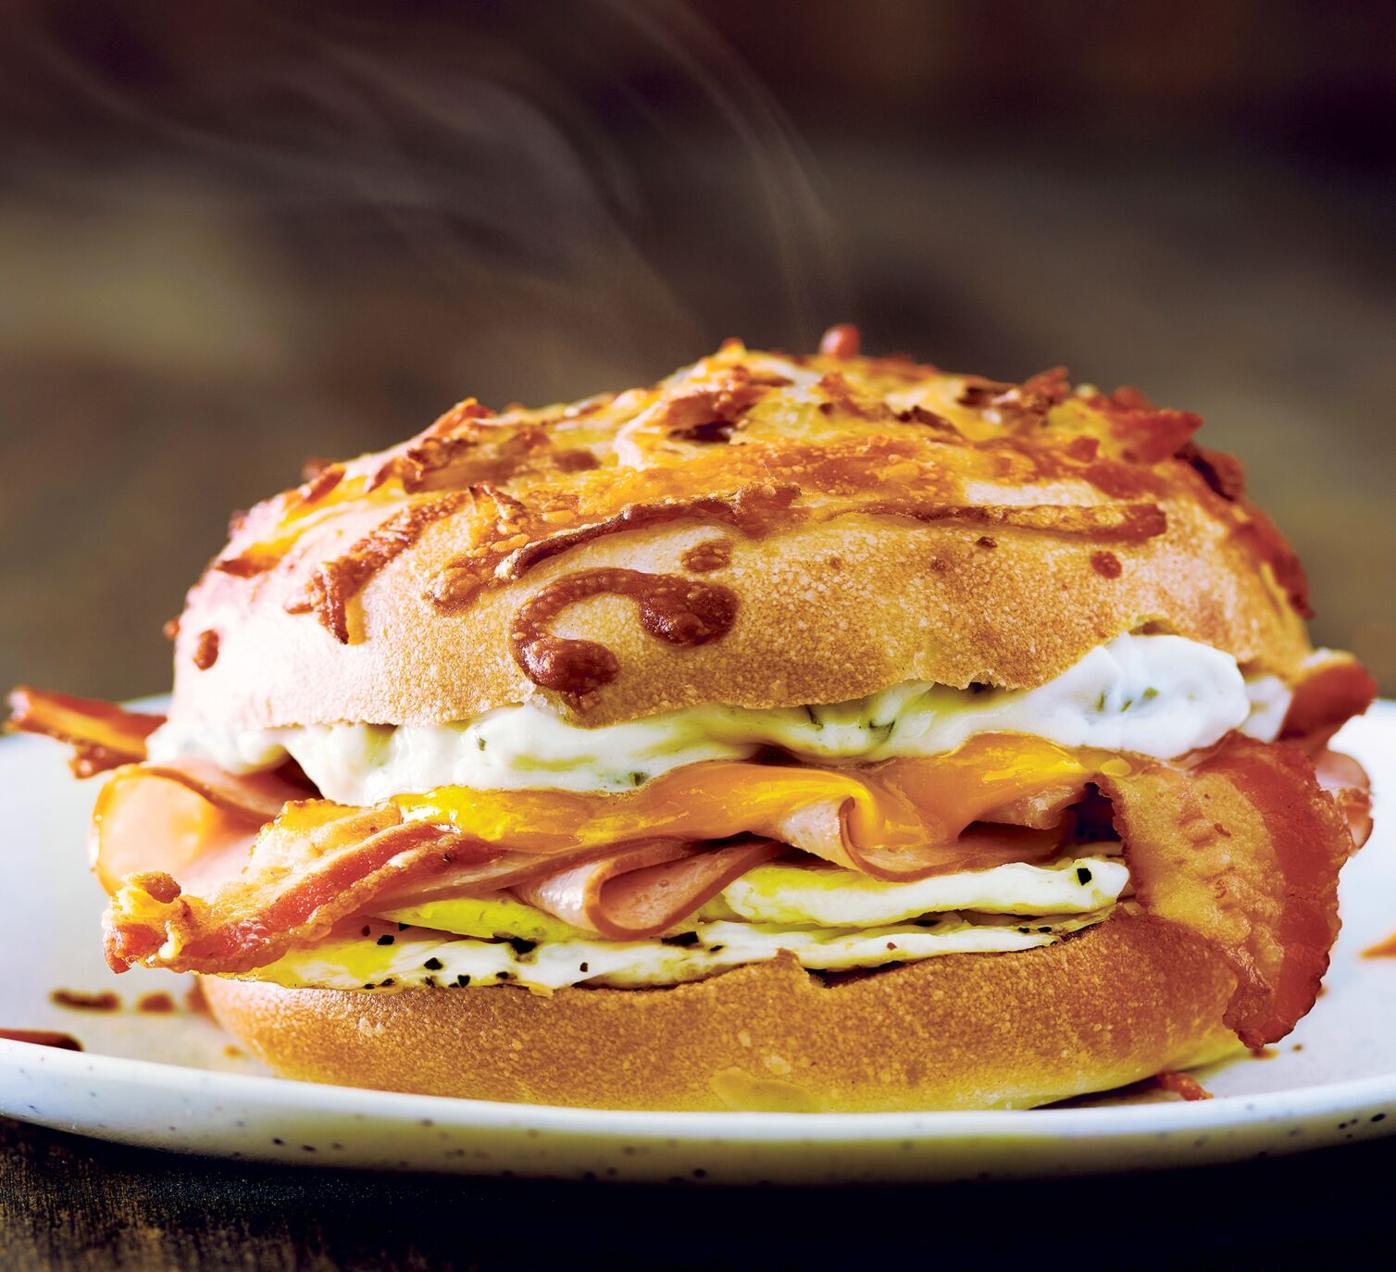 011321_MNS_Bagel_Day_001 The Farmhouse bagel sandwich